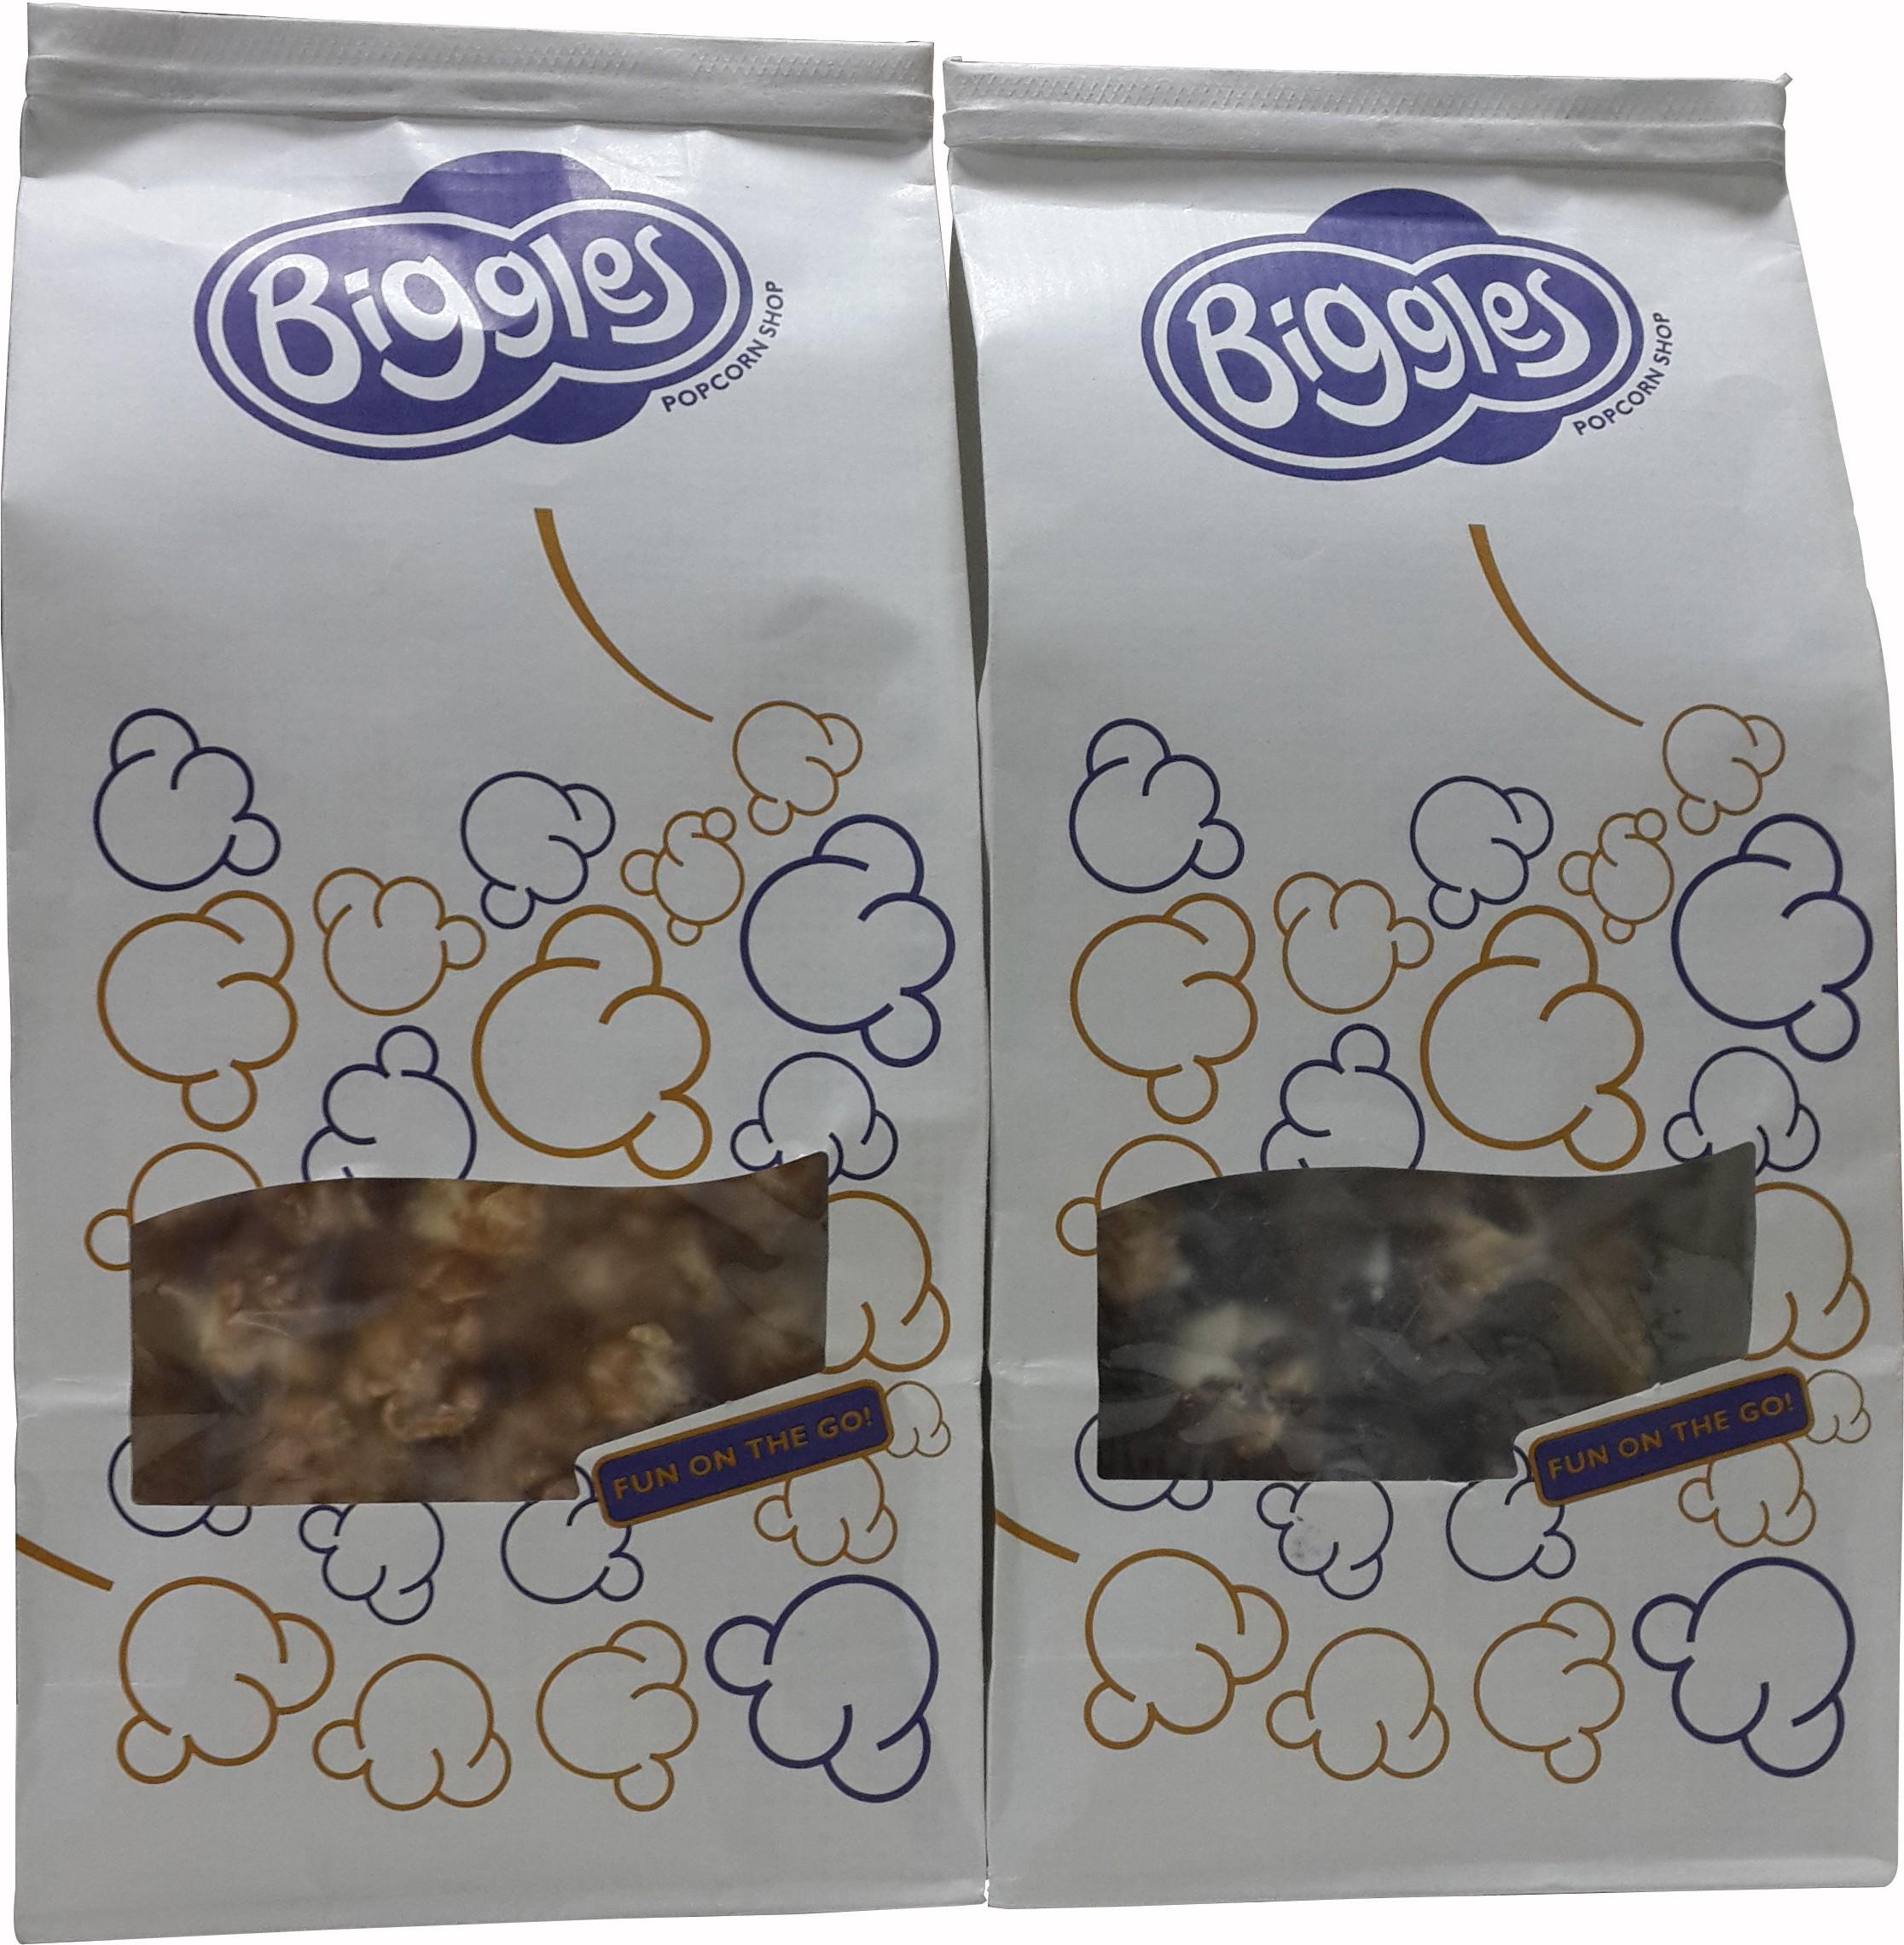 Biggles 1 Caramel Medium Pack Popcorn, 1 Dark & White Chocolate Medium Pack Popcorn Combo